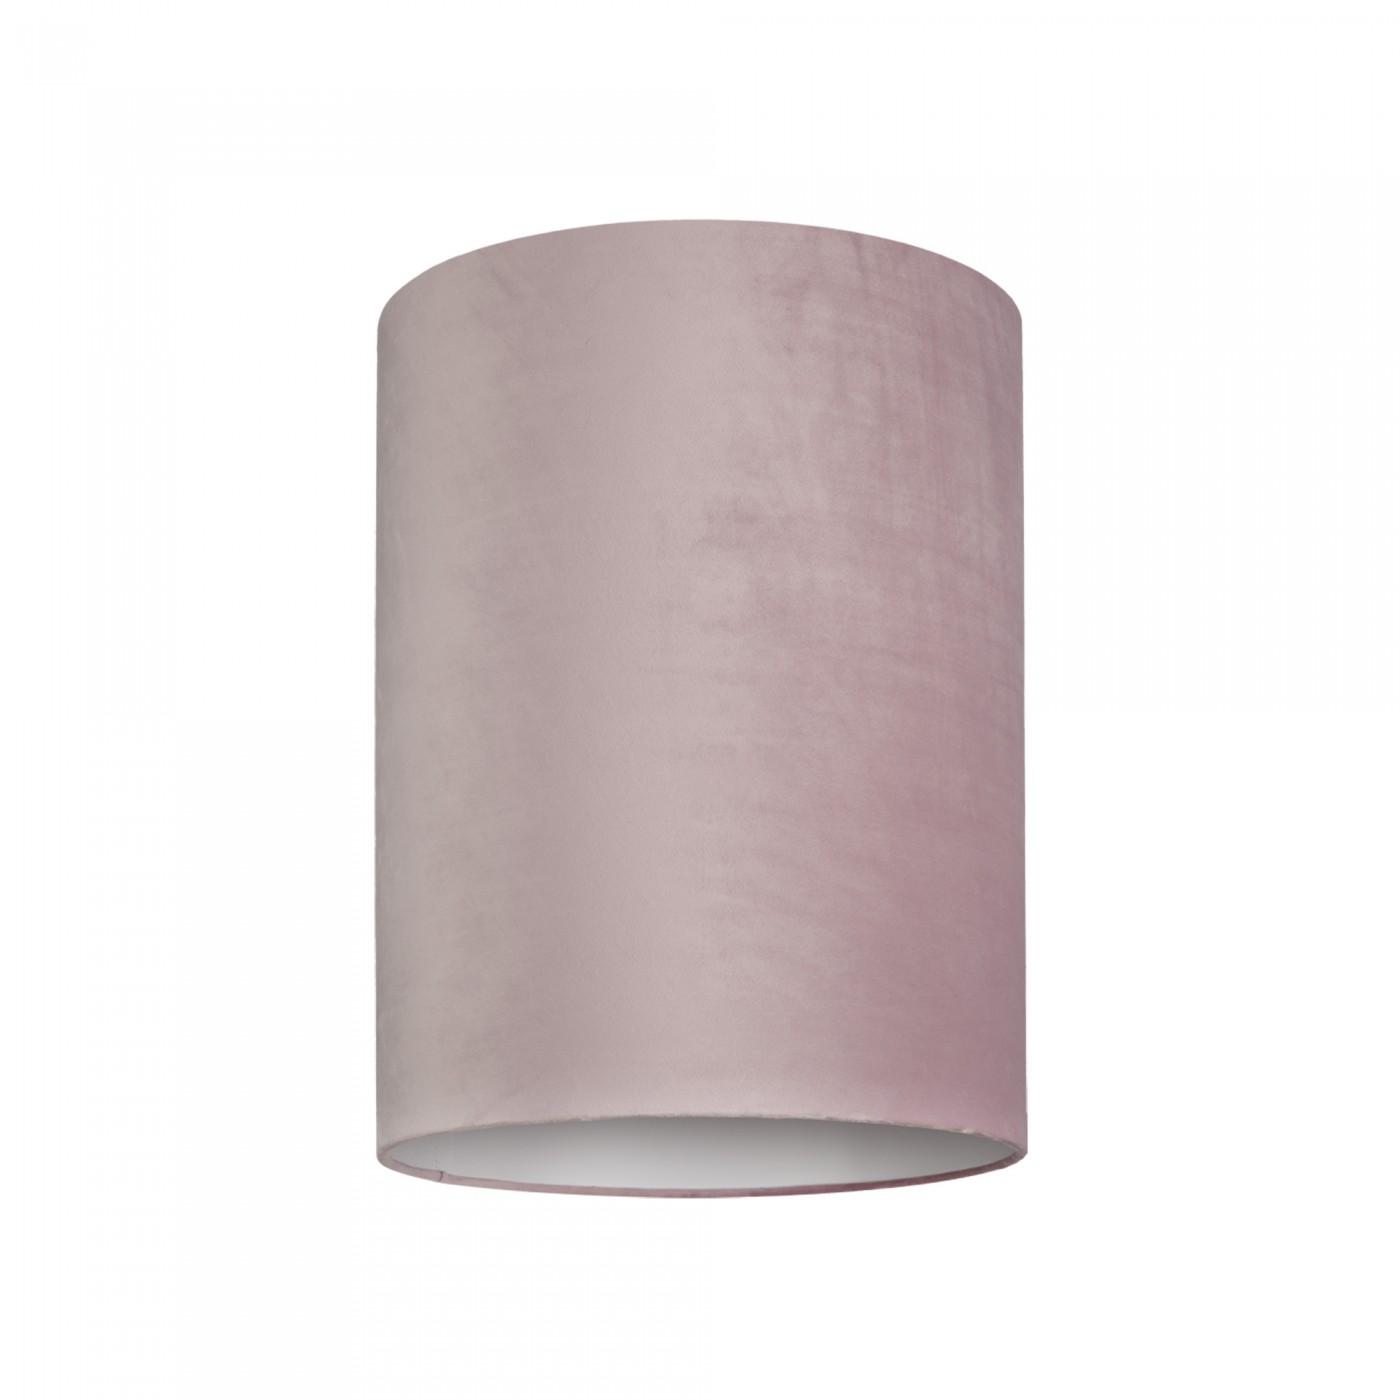 CAMELEON BARREL L V PI/WH 8511 Nowodvorski Lighting